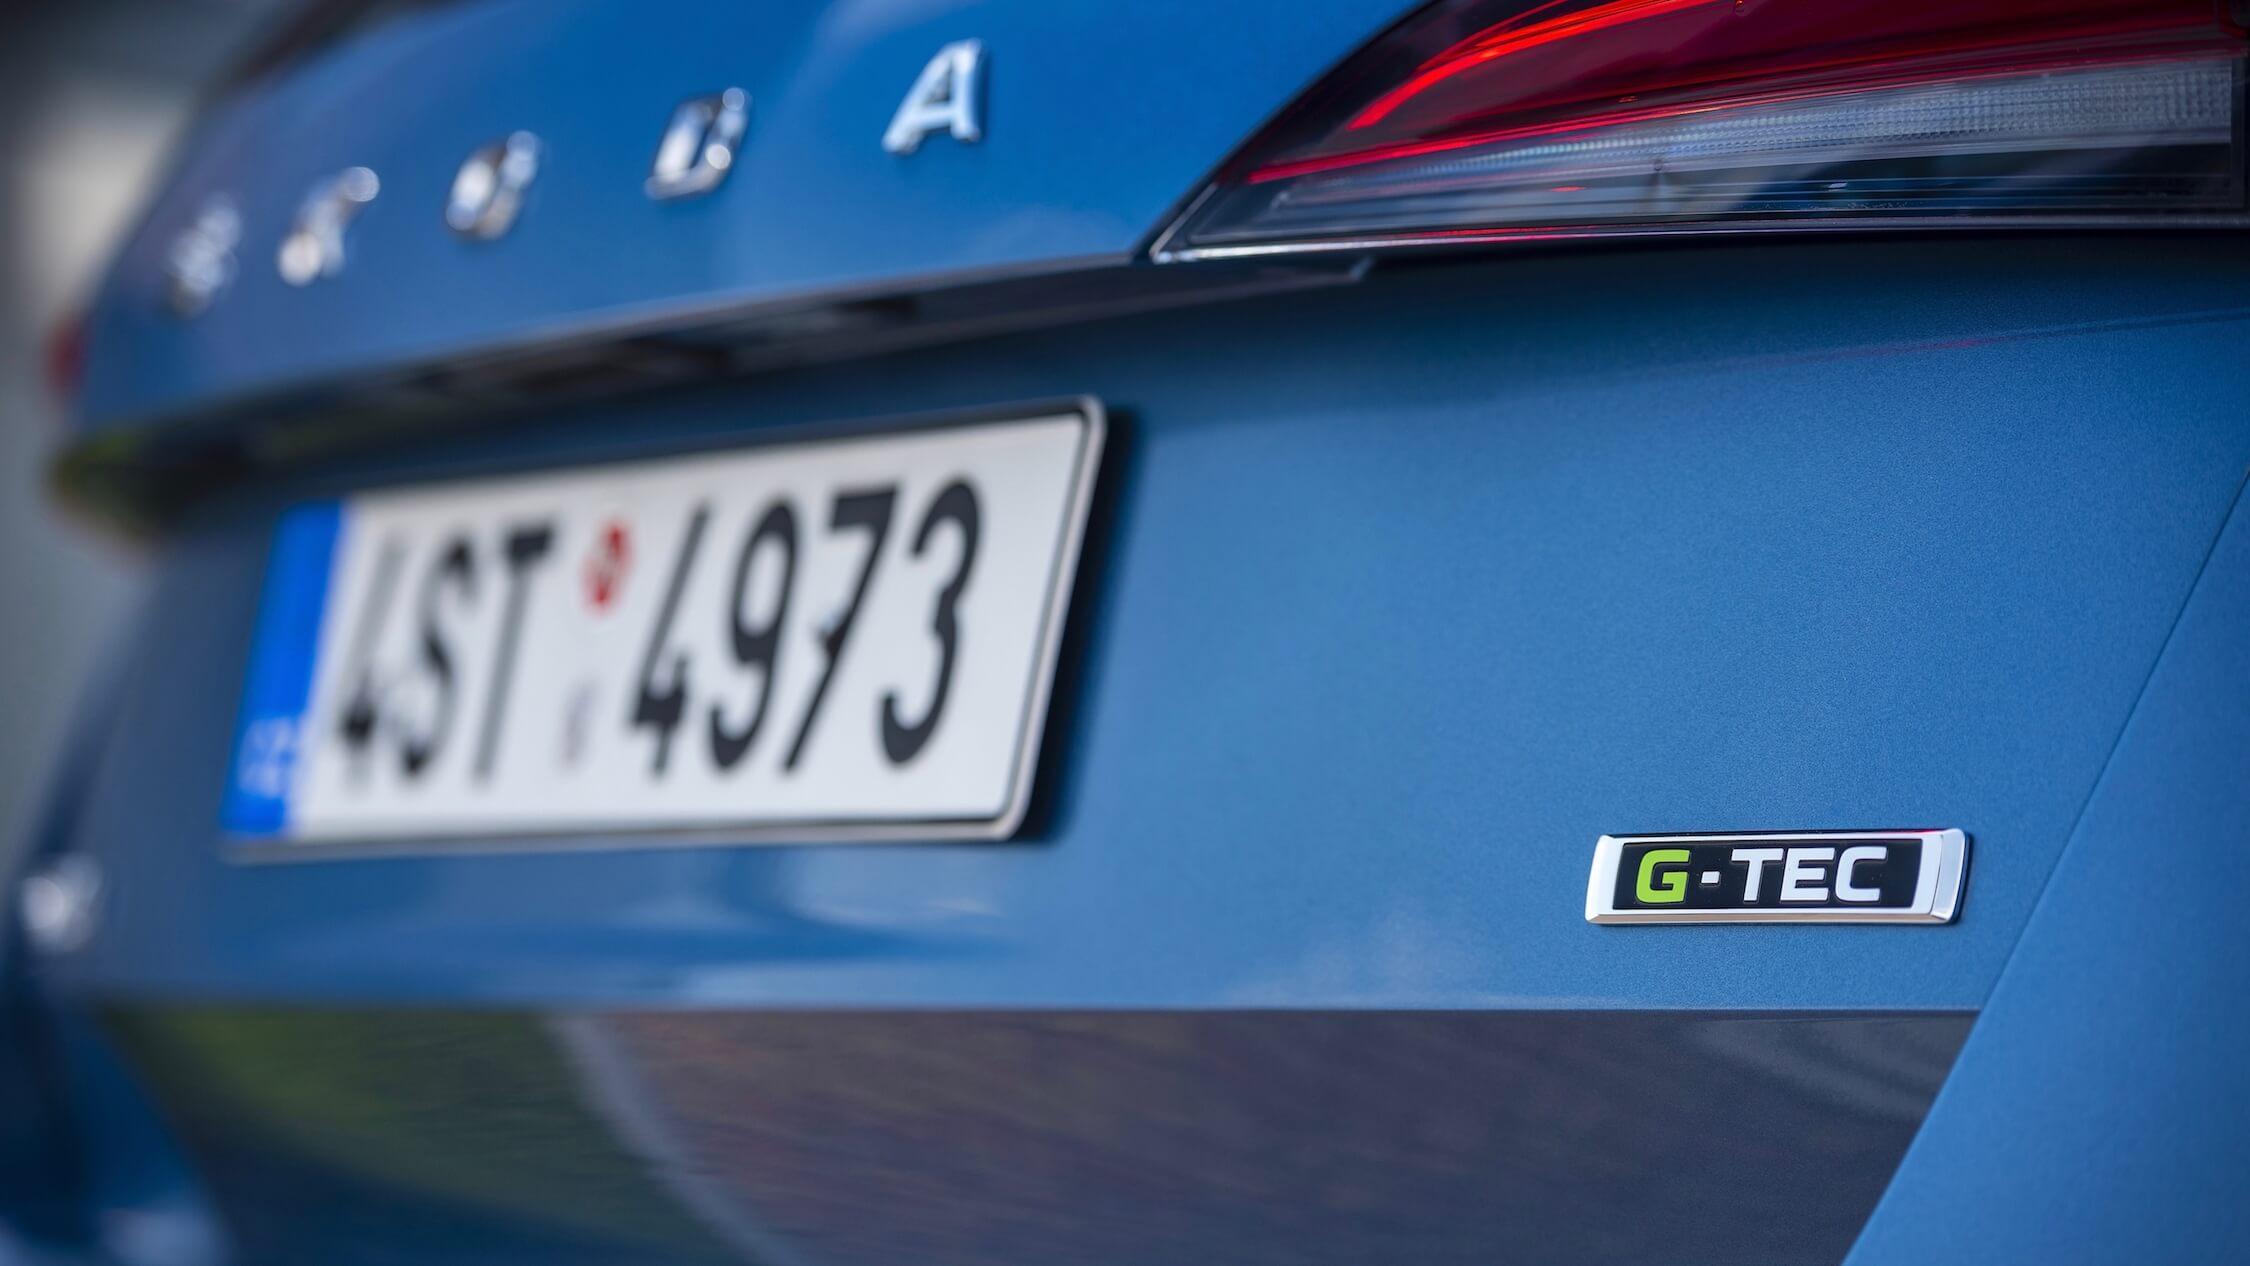 Skoda Scala CNG badge